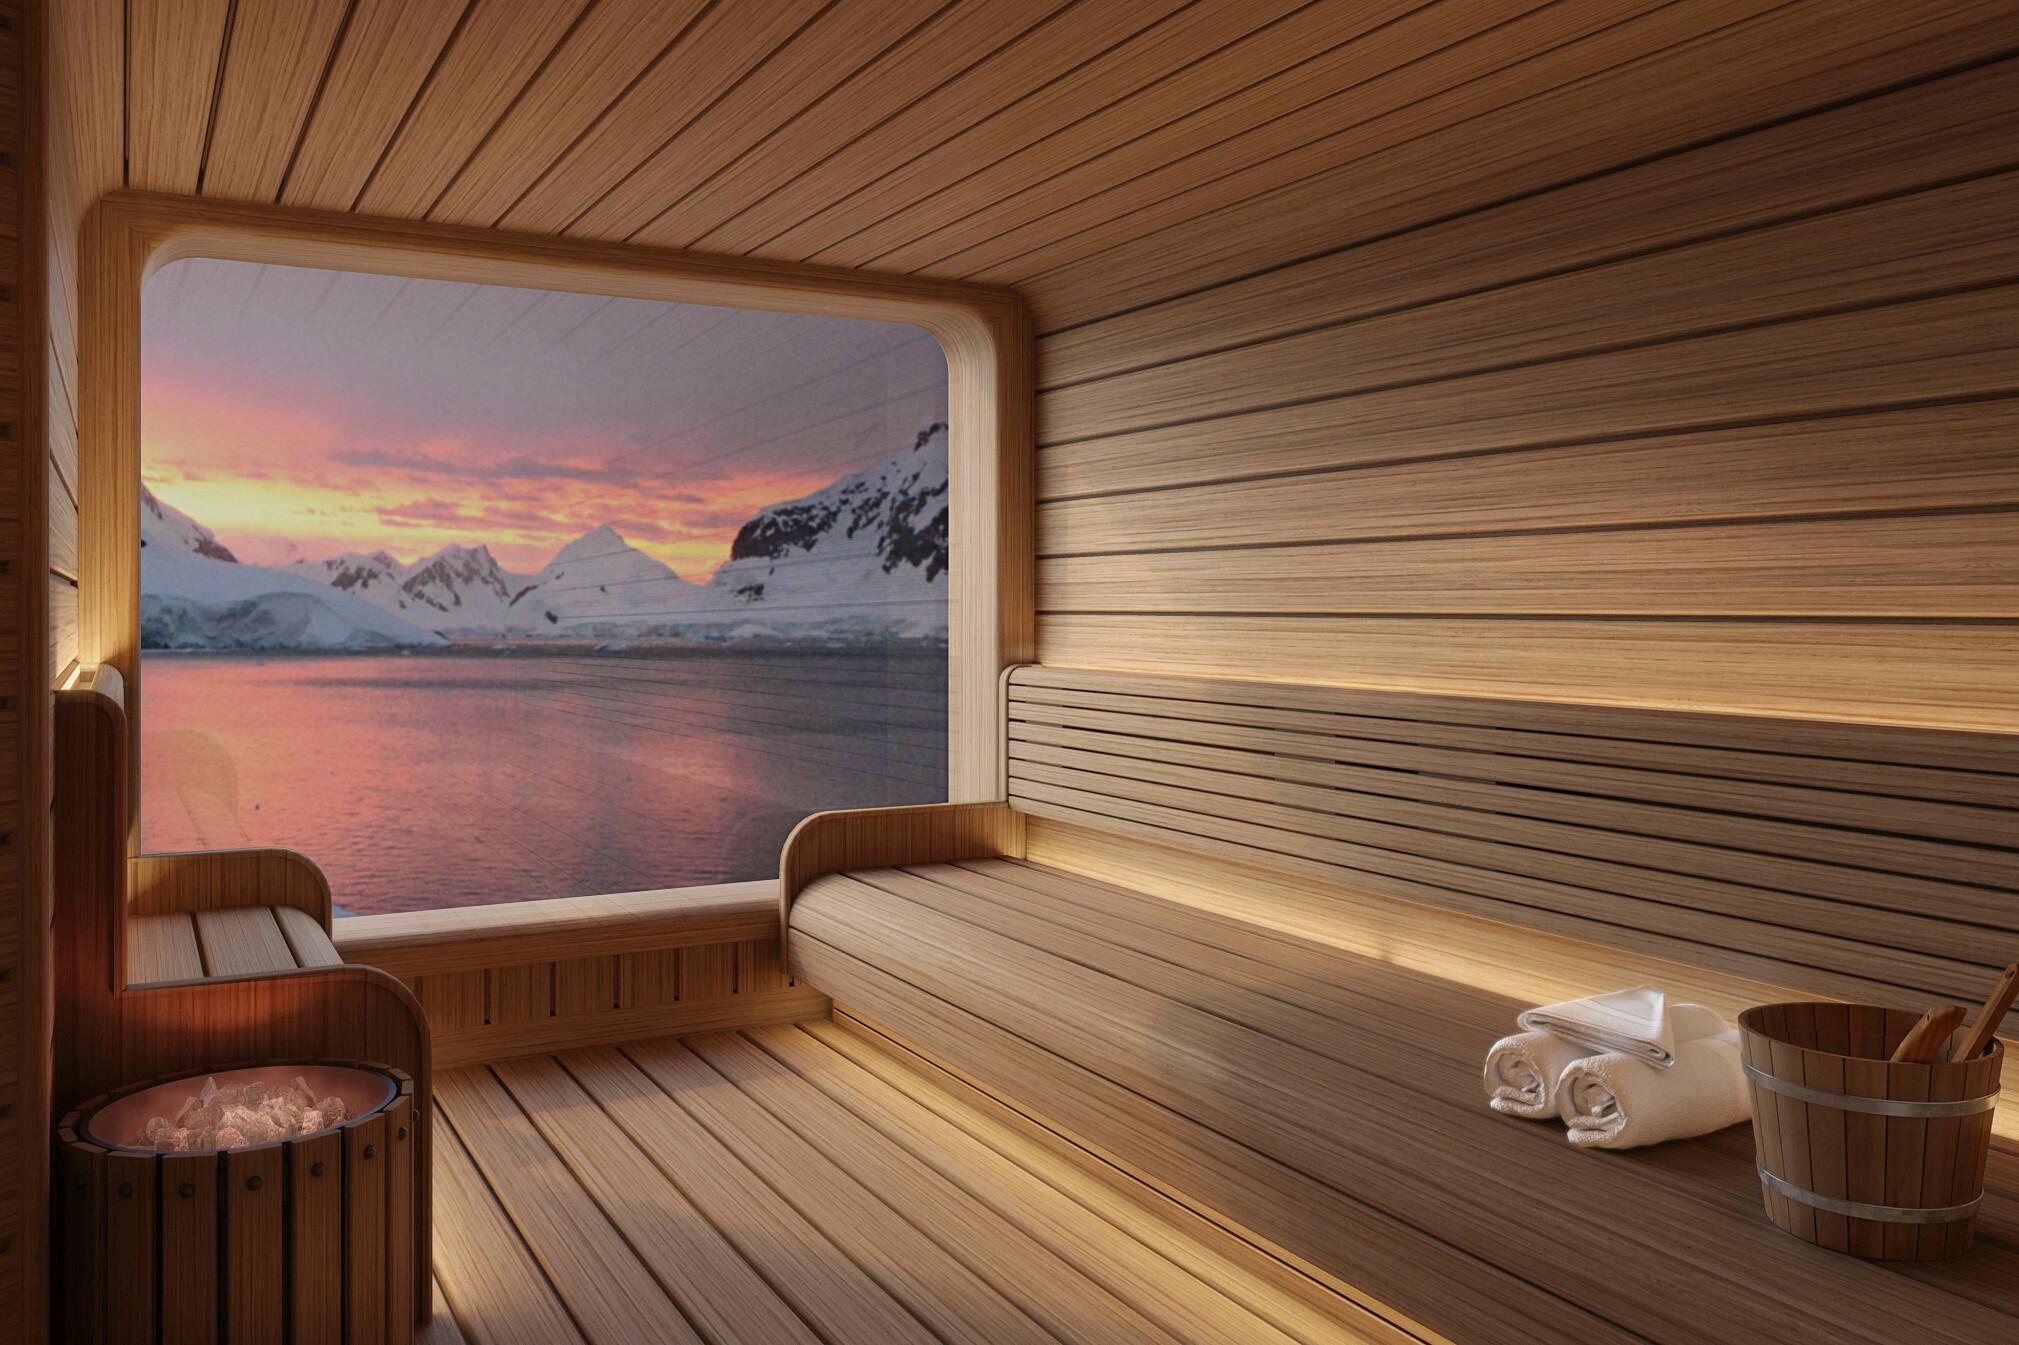 Seabourn Venture - Spa sauna